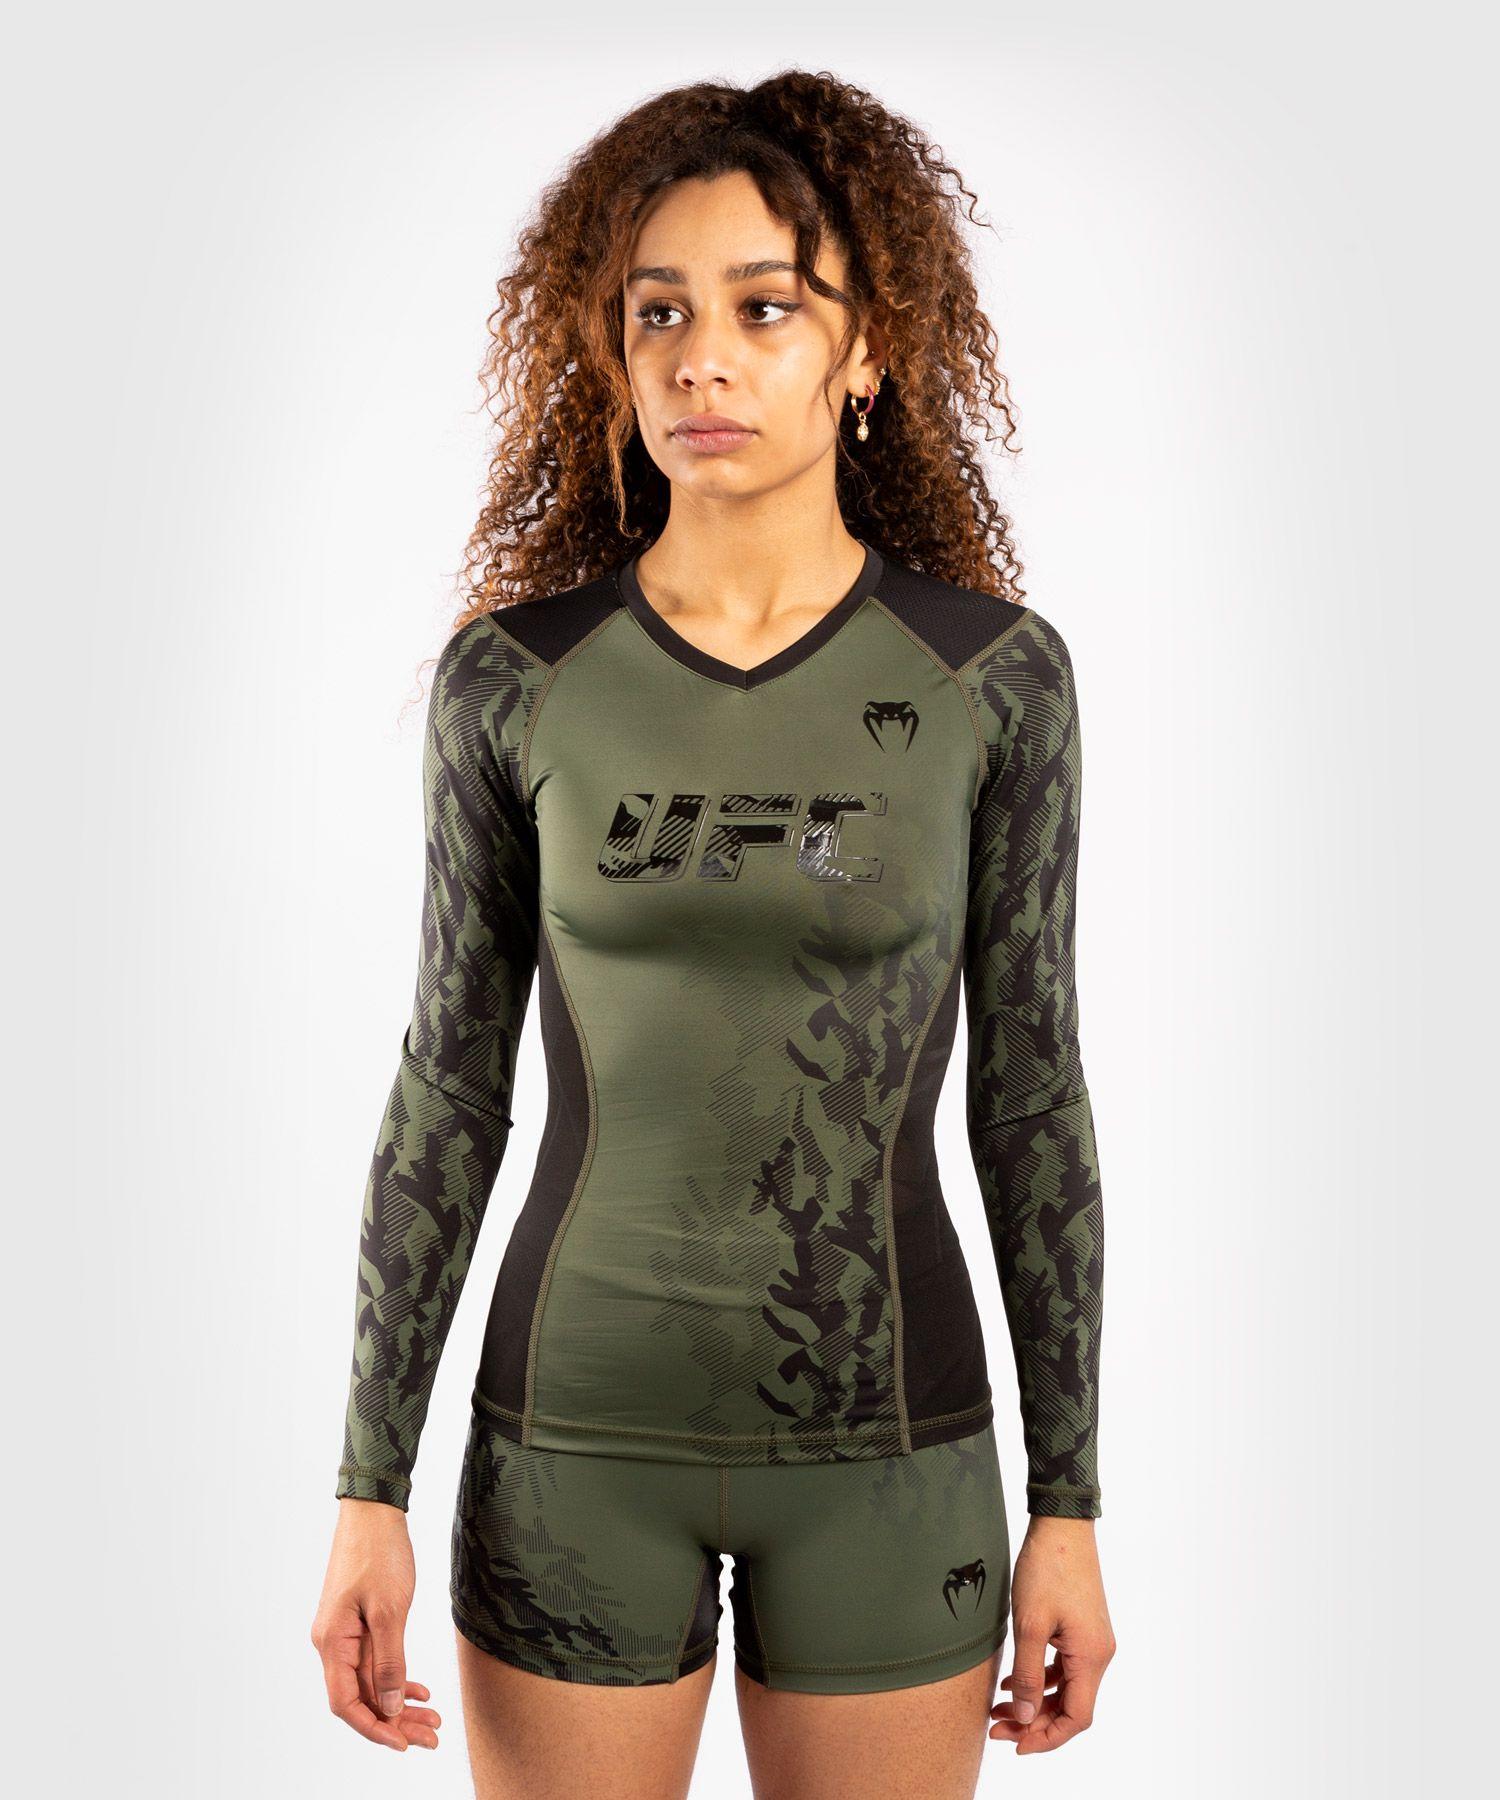 UFC Venum Authentic Fight Week Women's Performance Long Sleeve Rashguard - Khaki